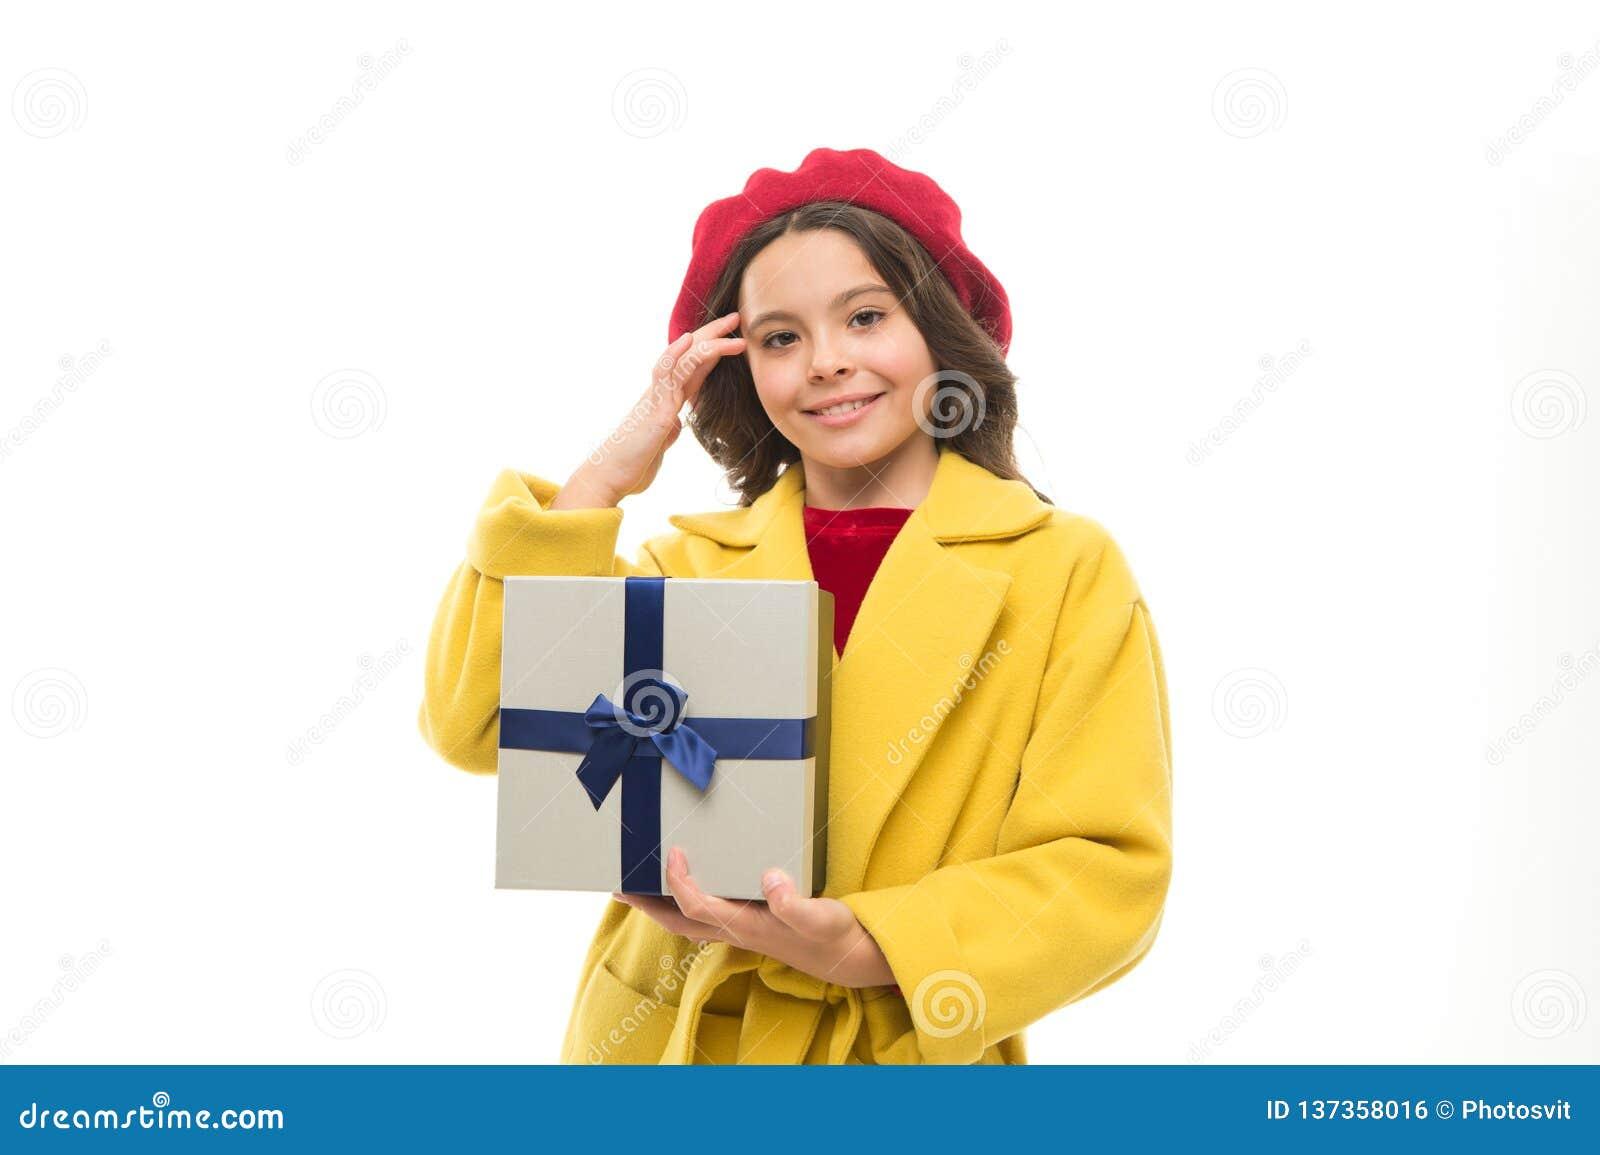 Birthday Wish List Girl Happy Kid Hold Gift Box Shopping